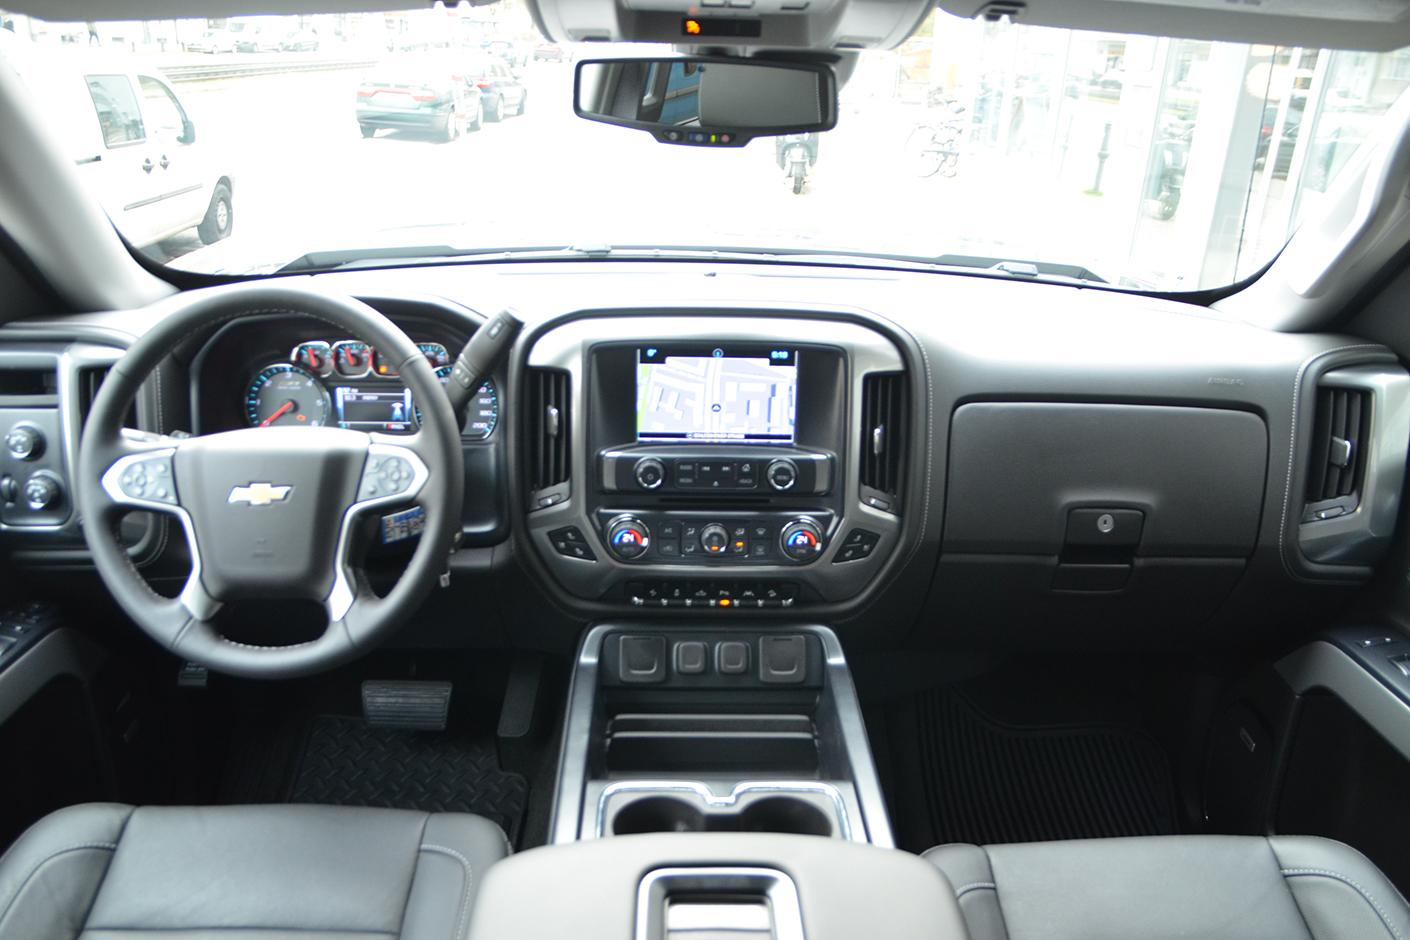 Chevrolet Silverado LTZ 2LZ Z71 2018-9